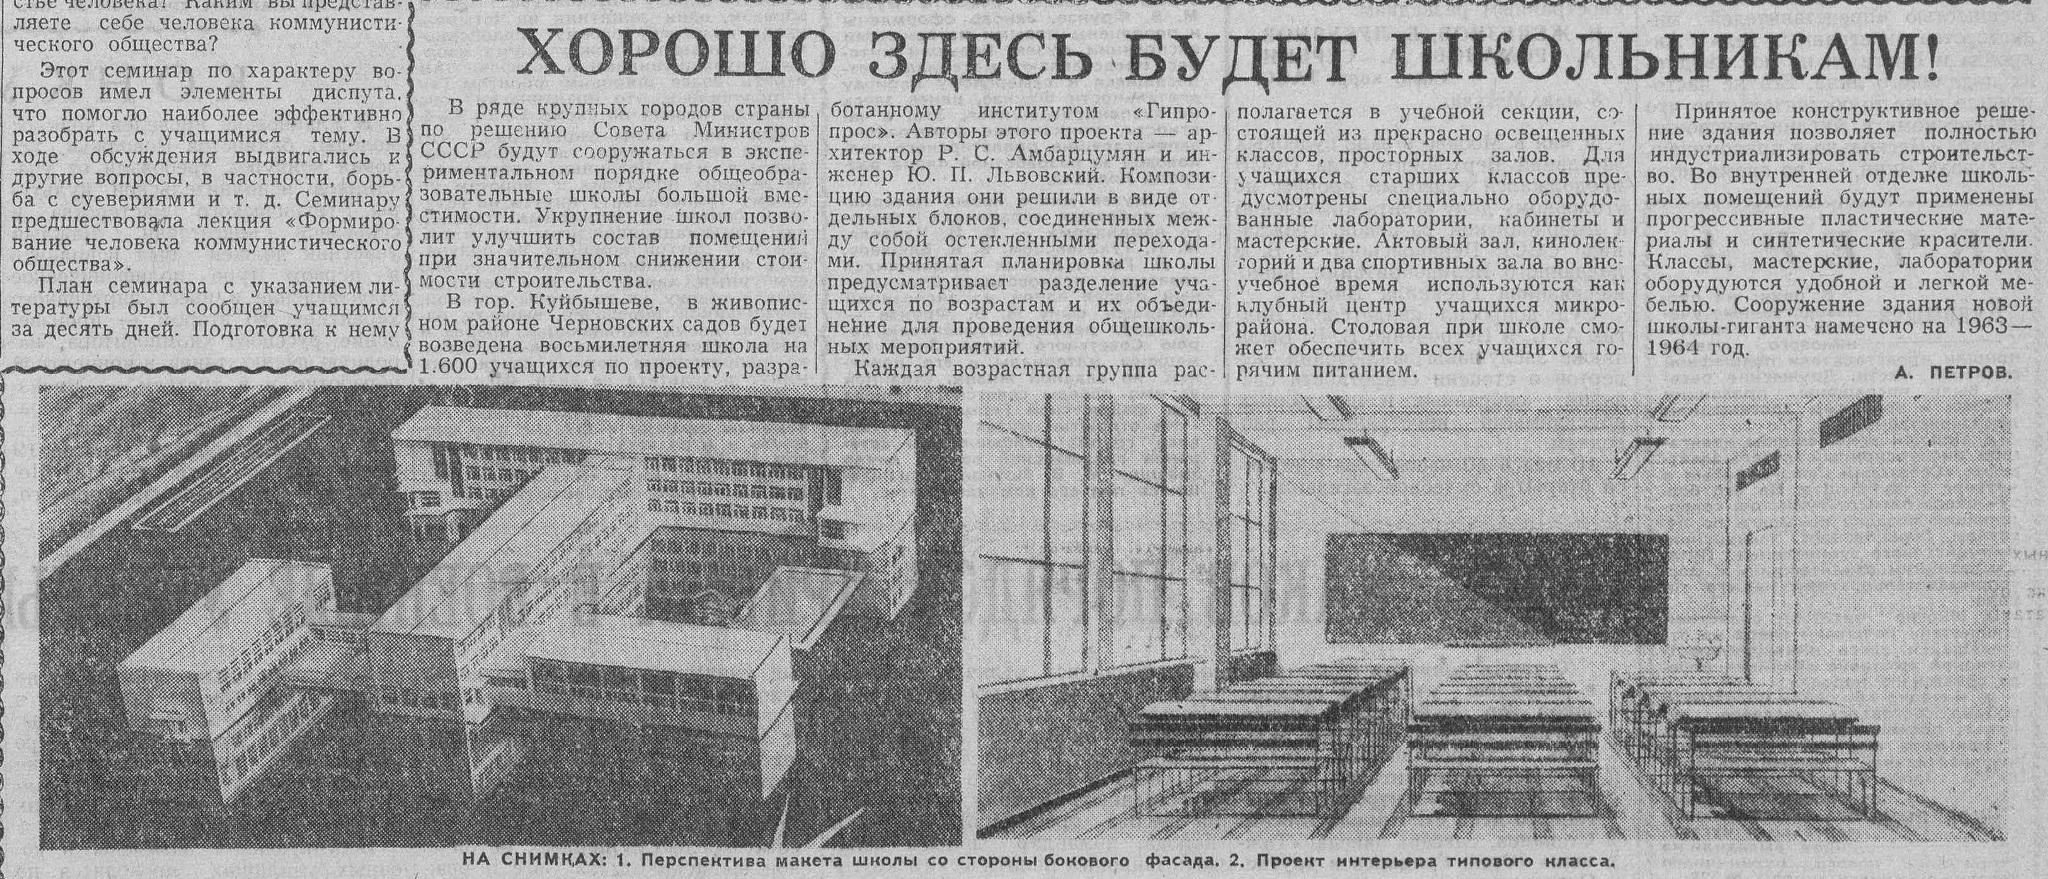 Мориса Тореза-ФОТО-34-ВКа-1963-05-10-проект школы N 28